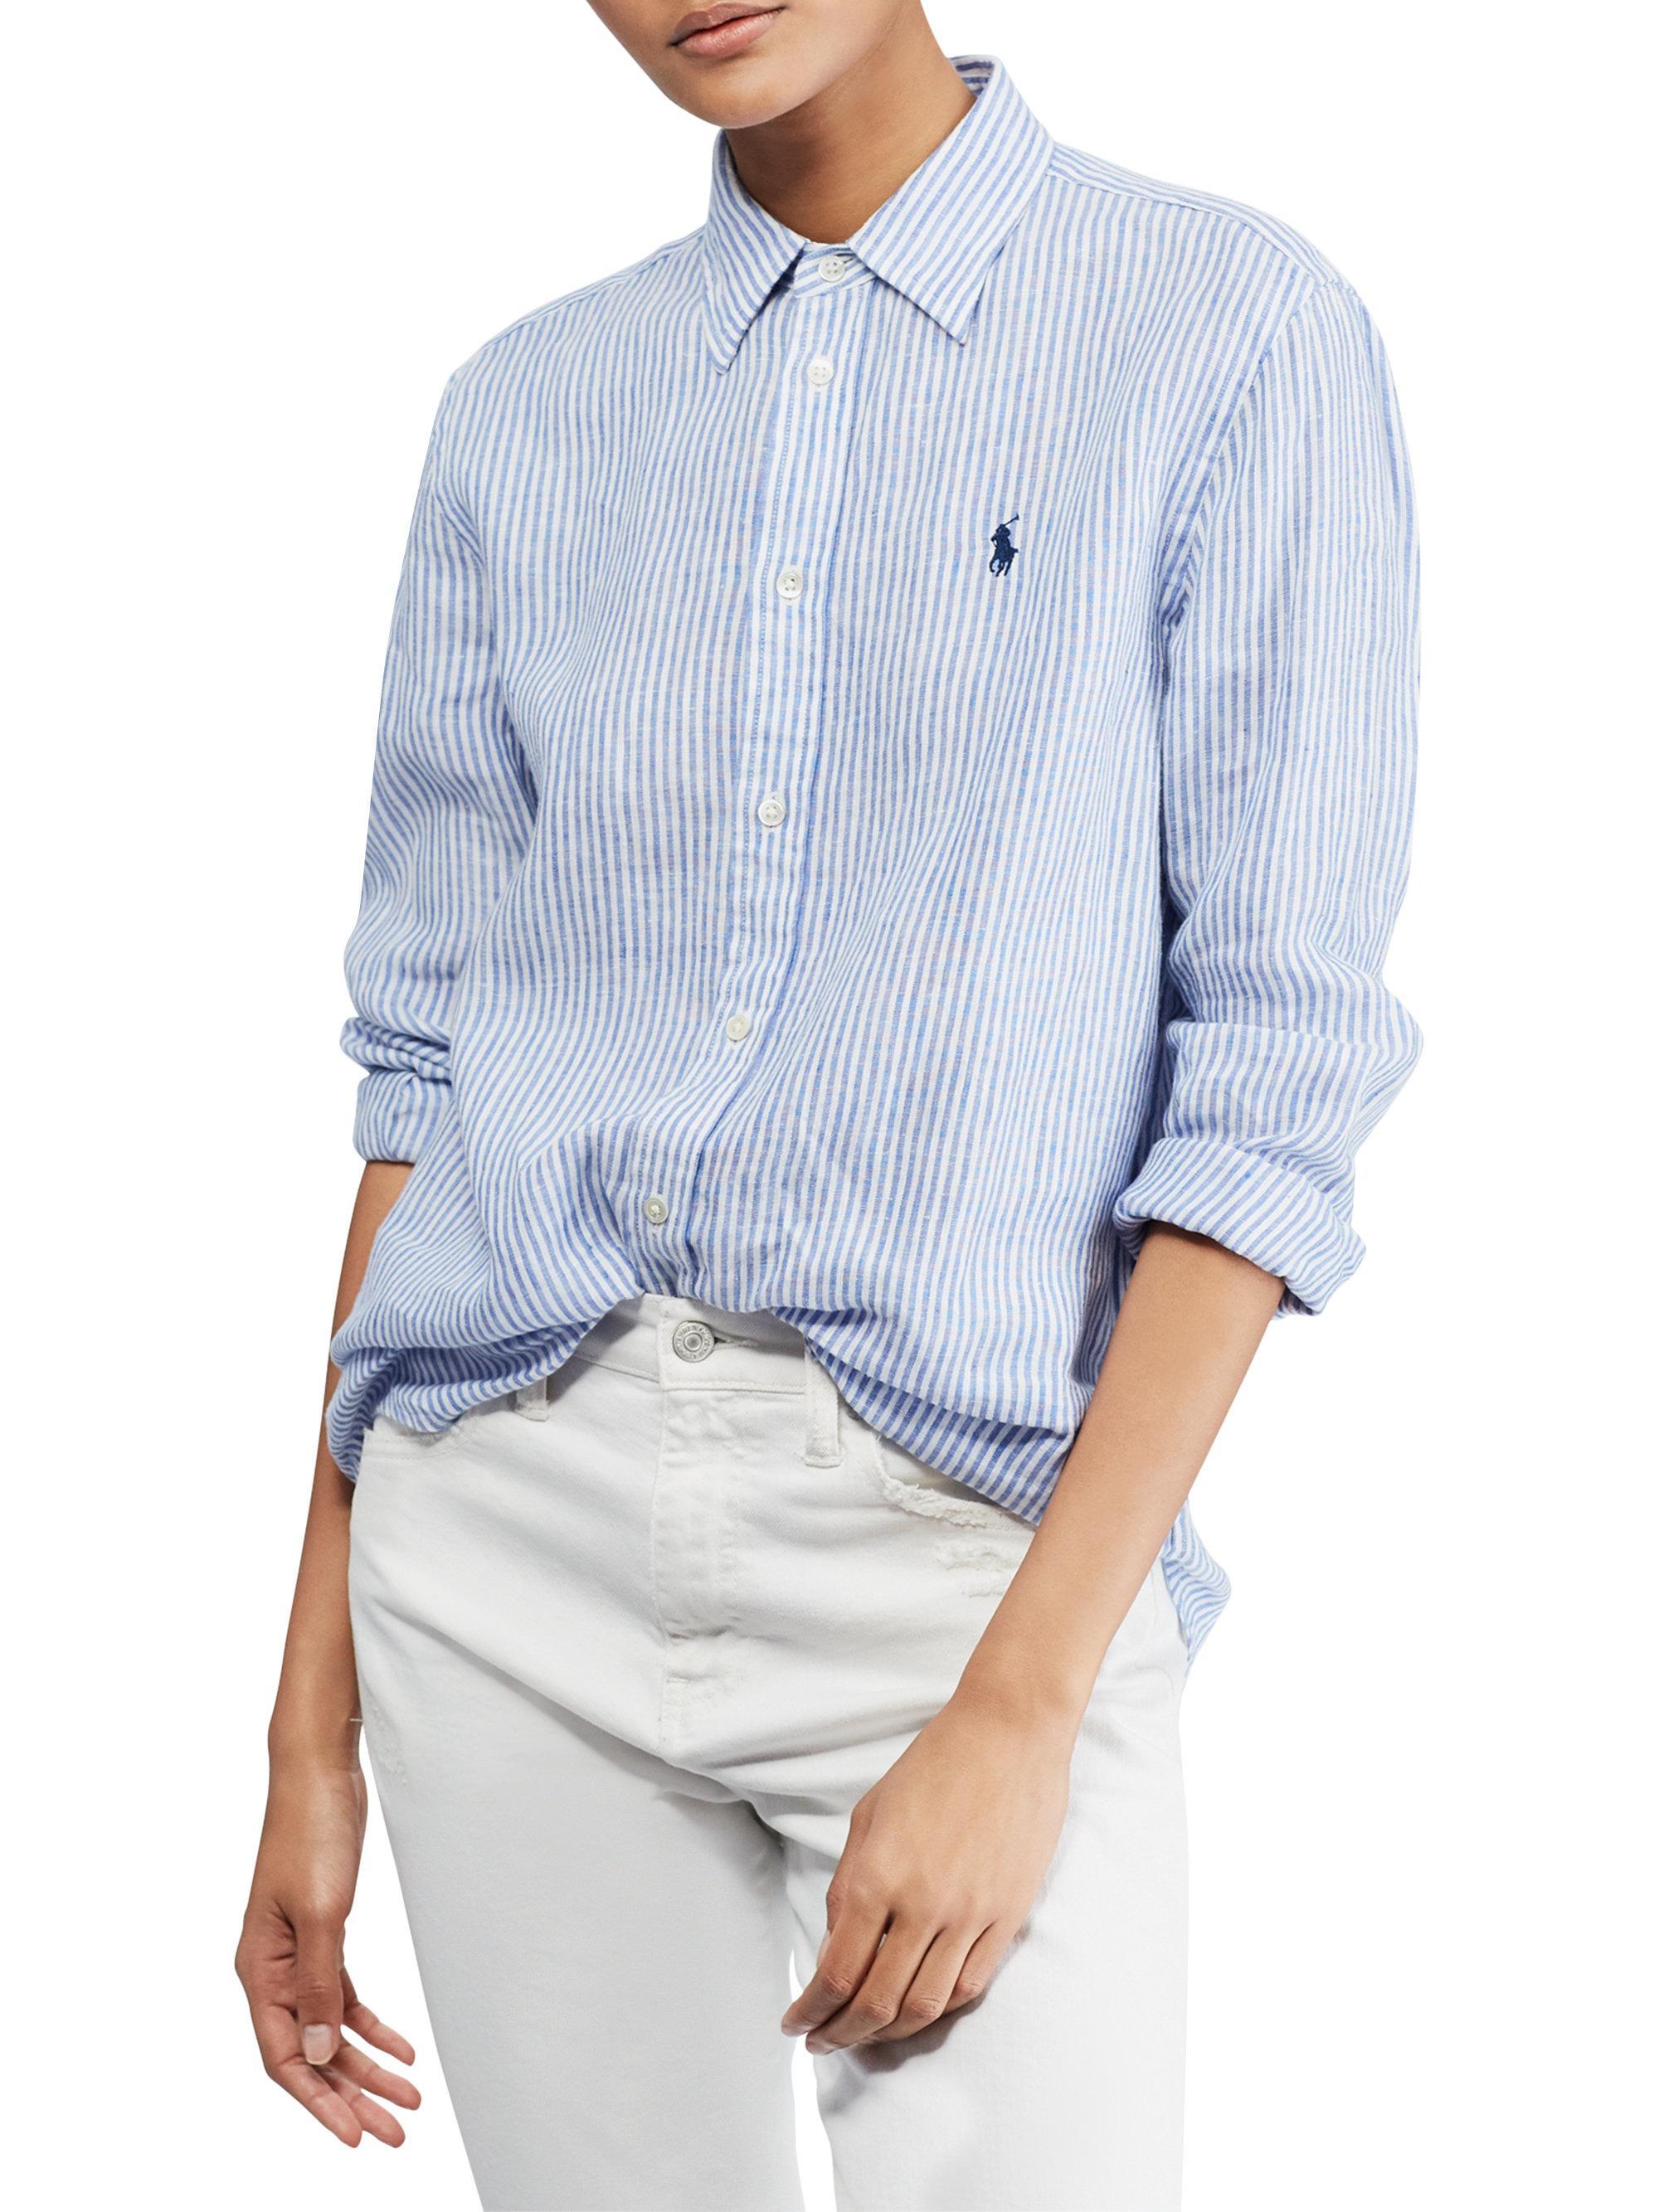 25a6f10c88 ... clearance lyst polo ralph lauren relaxed striped linen shirt in blue  for men 56c6e 41405